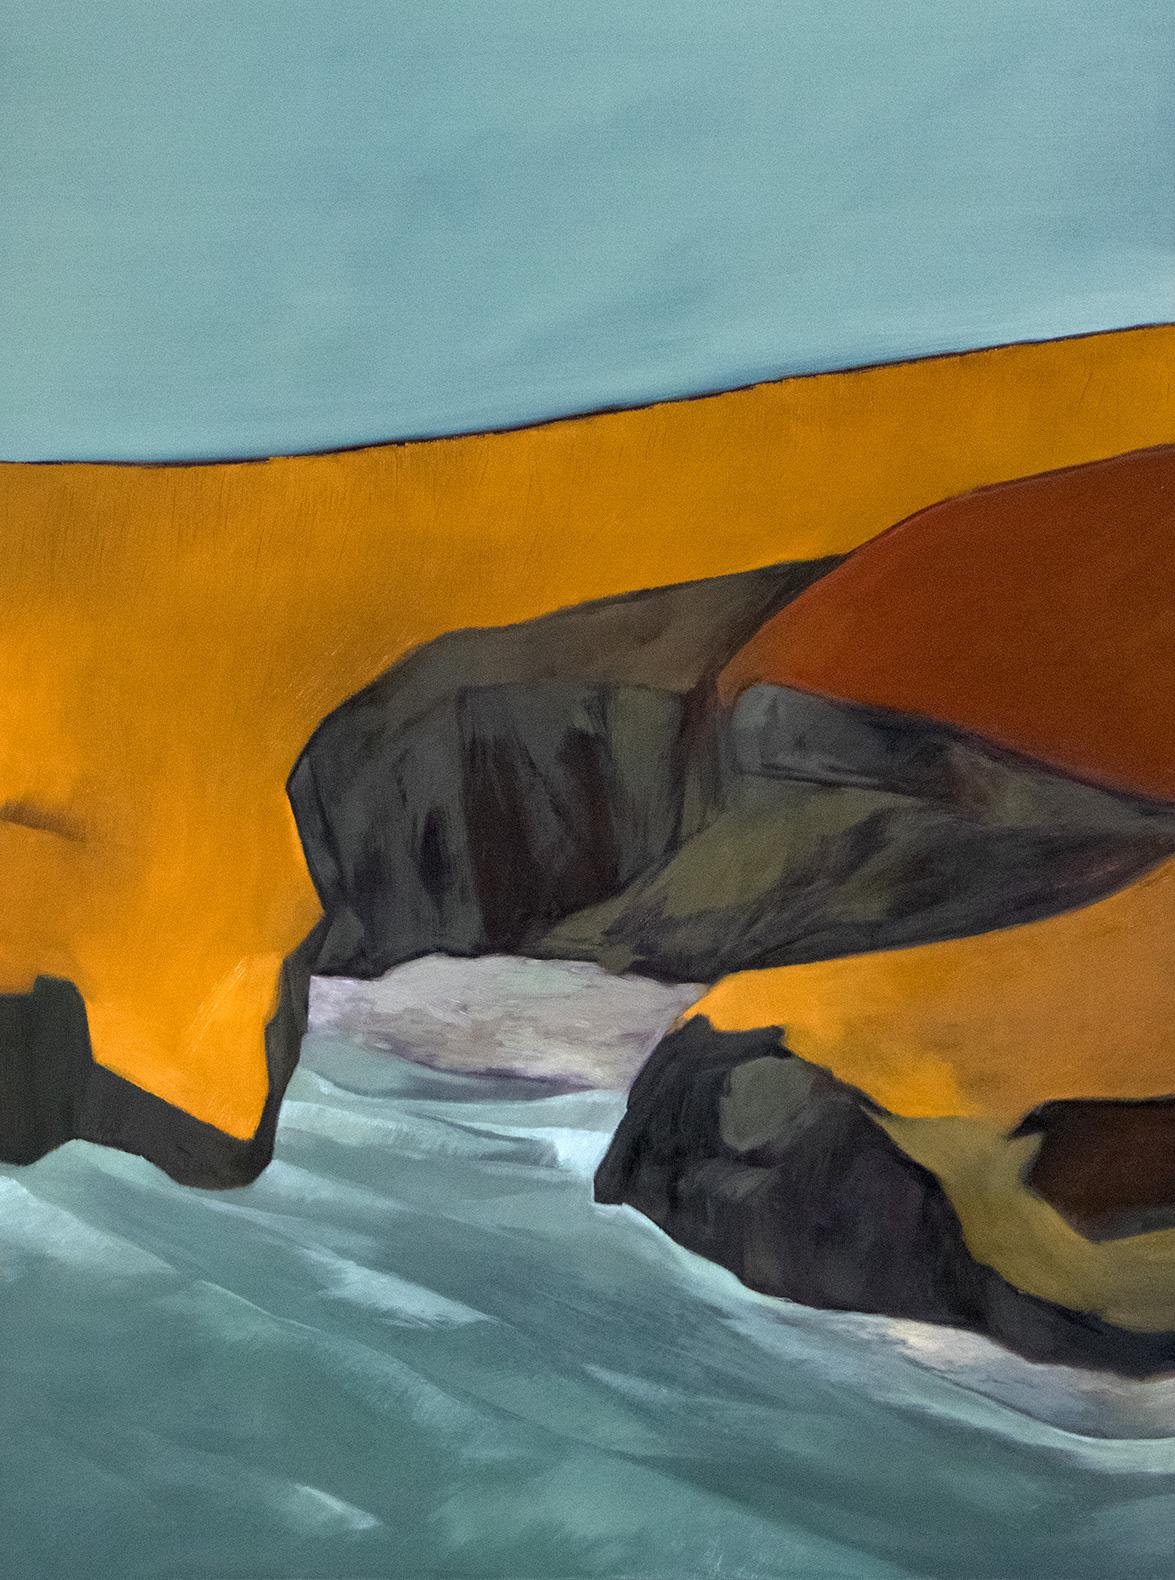 Otago peninsula, 2018 / Oil on canvas (SOLD)